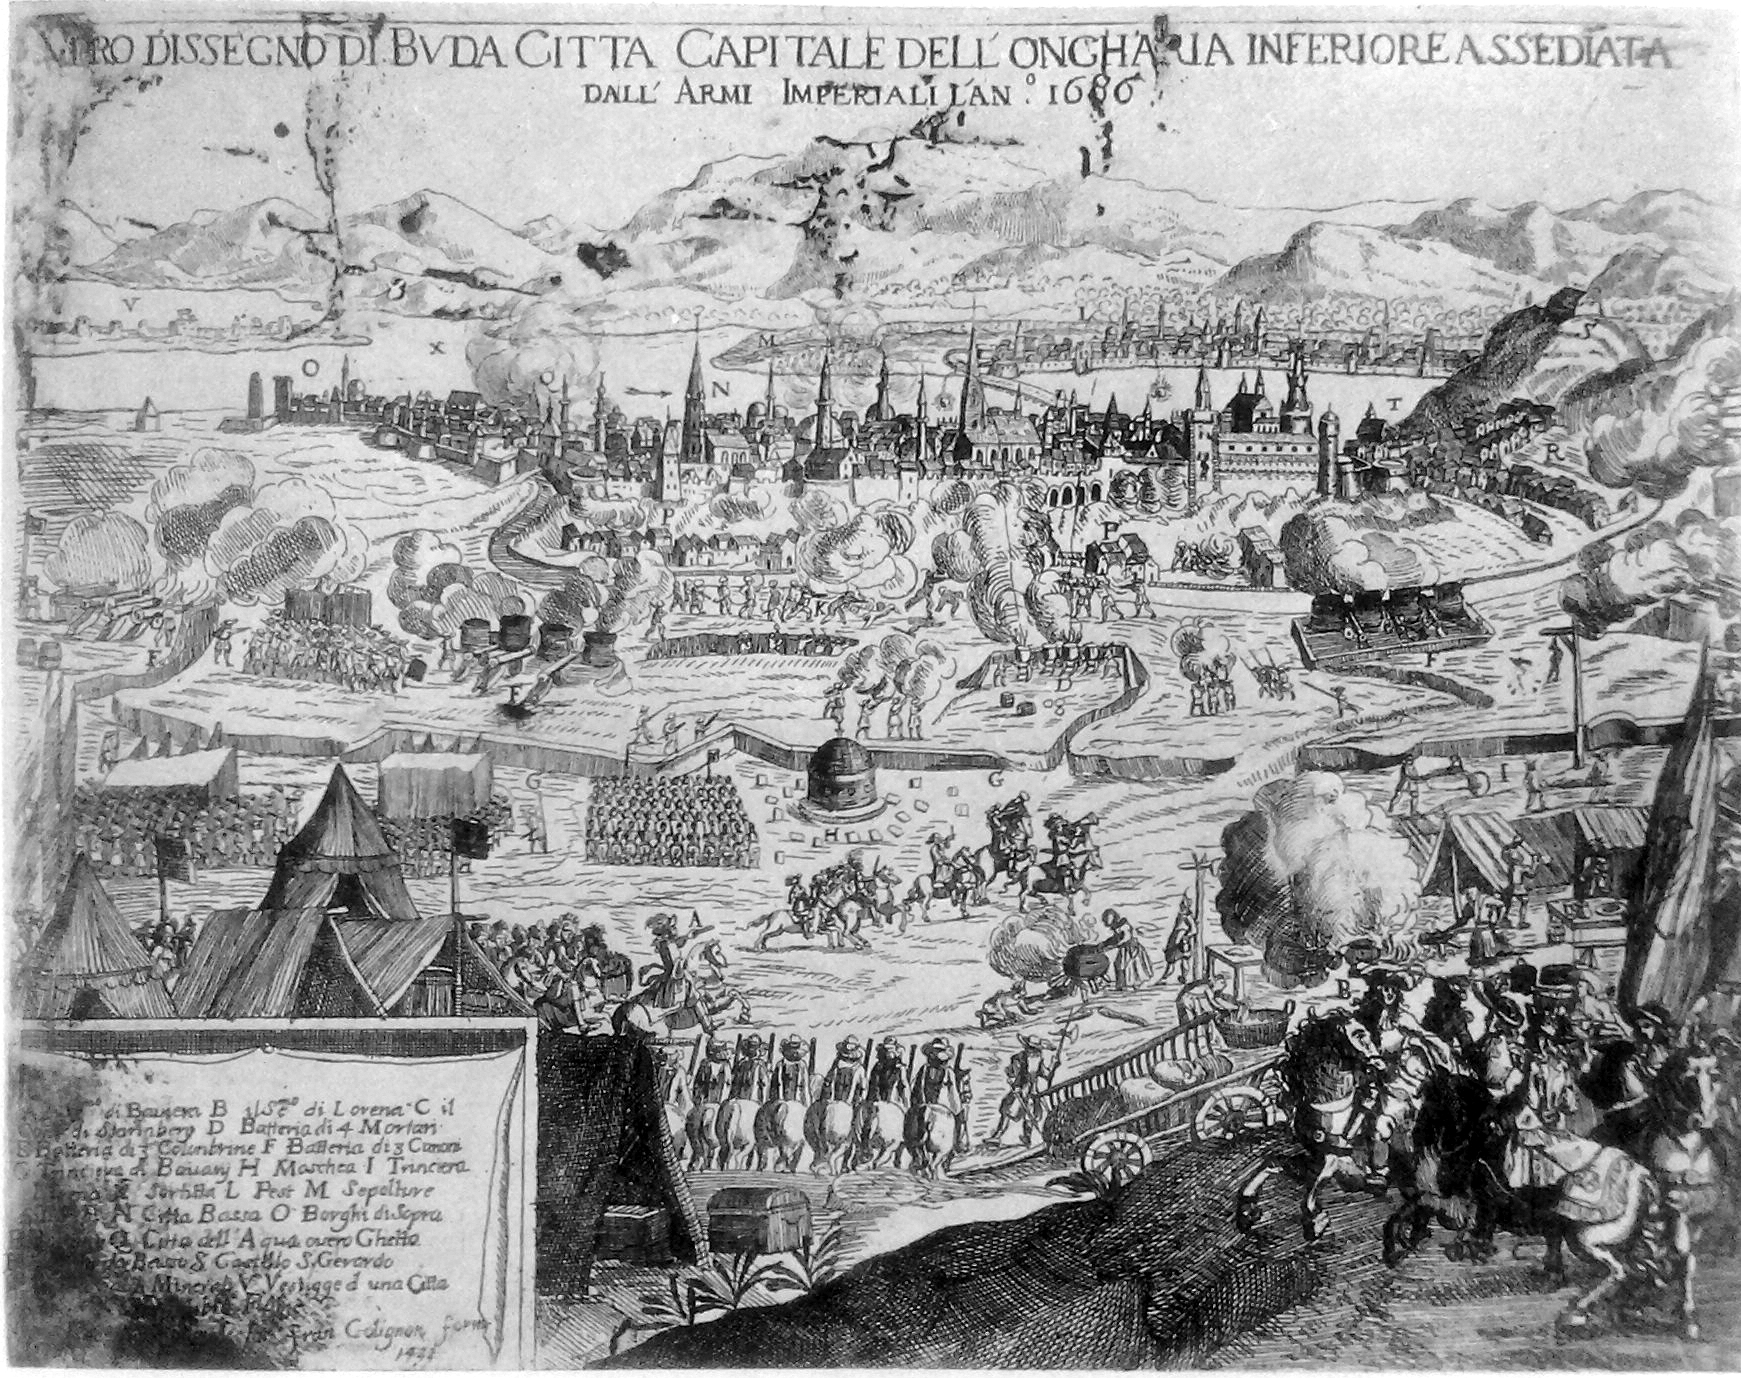 http://upload.wikimedia.org/wikipedia/commons/7/7e/Buda_1686-Louis_Gomier.jpg